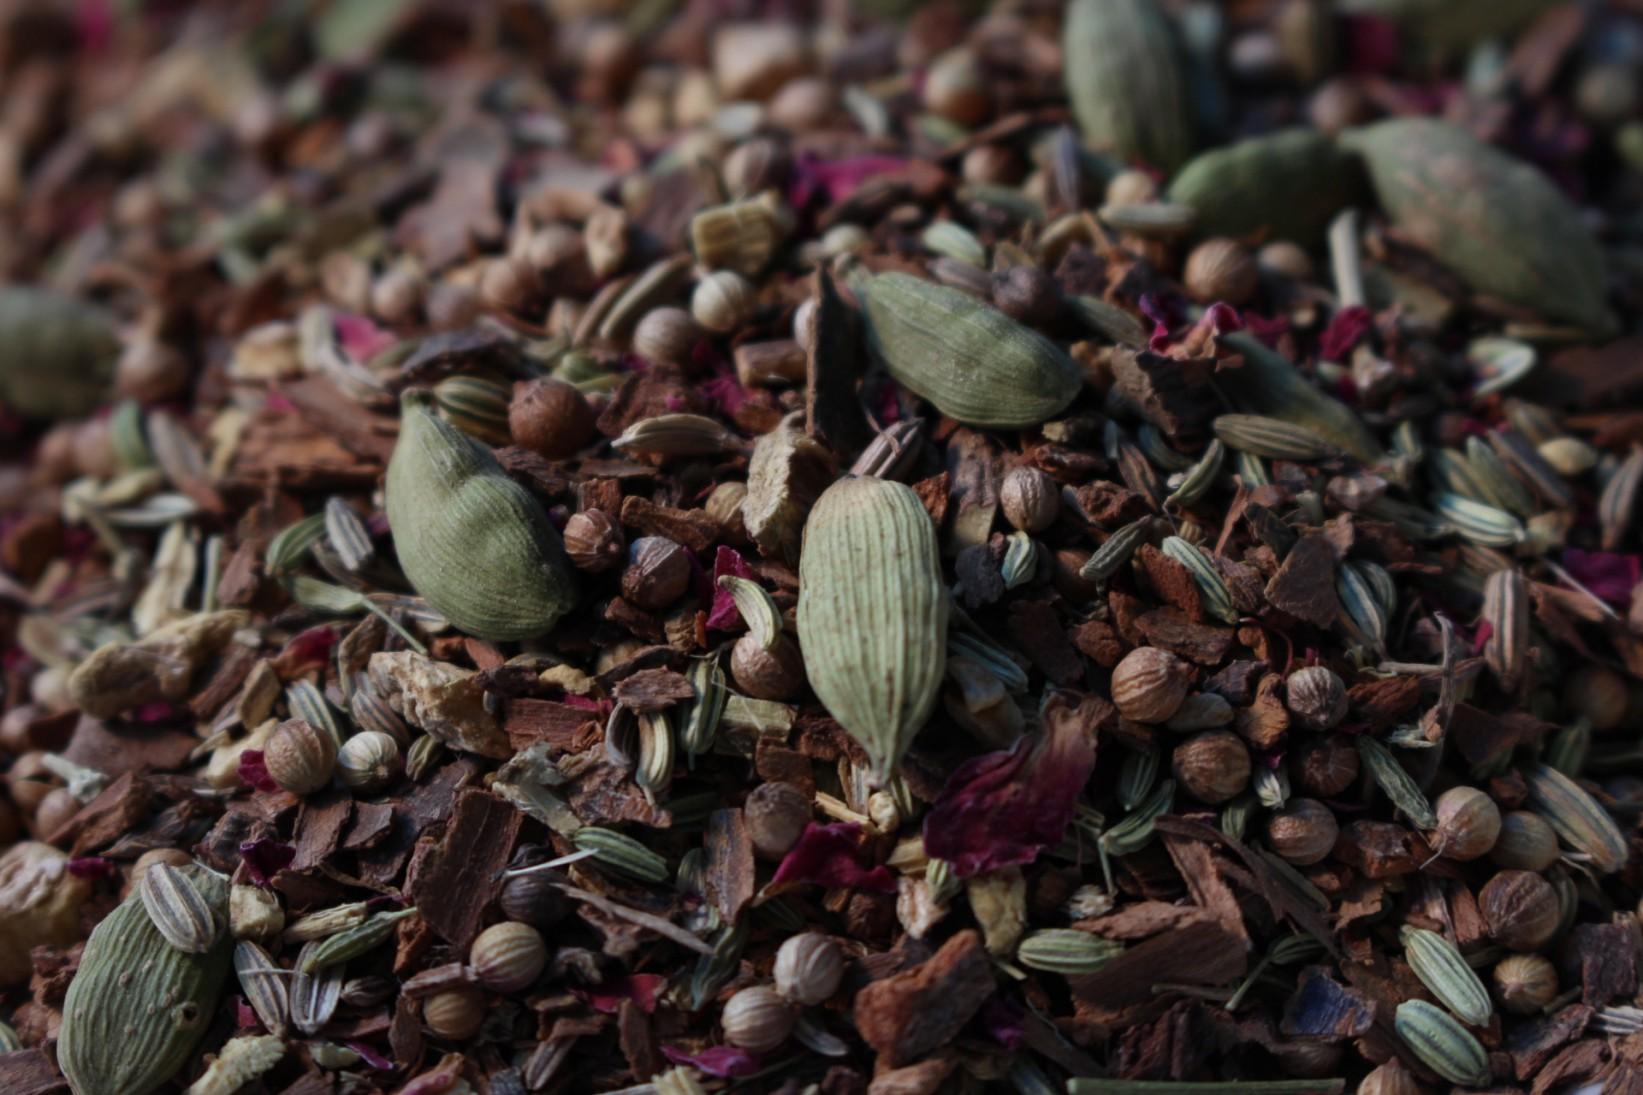 Liquorice, cinnamon, cardamom, coriander, fennel, ginger